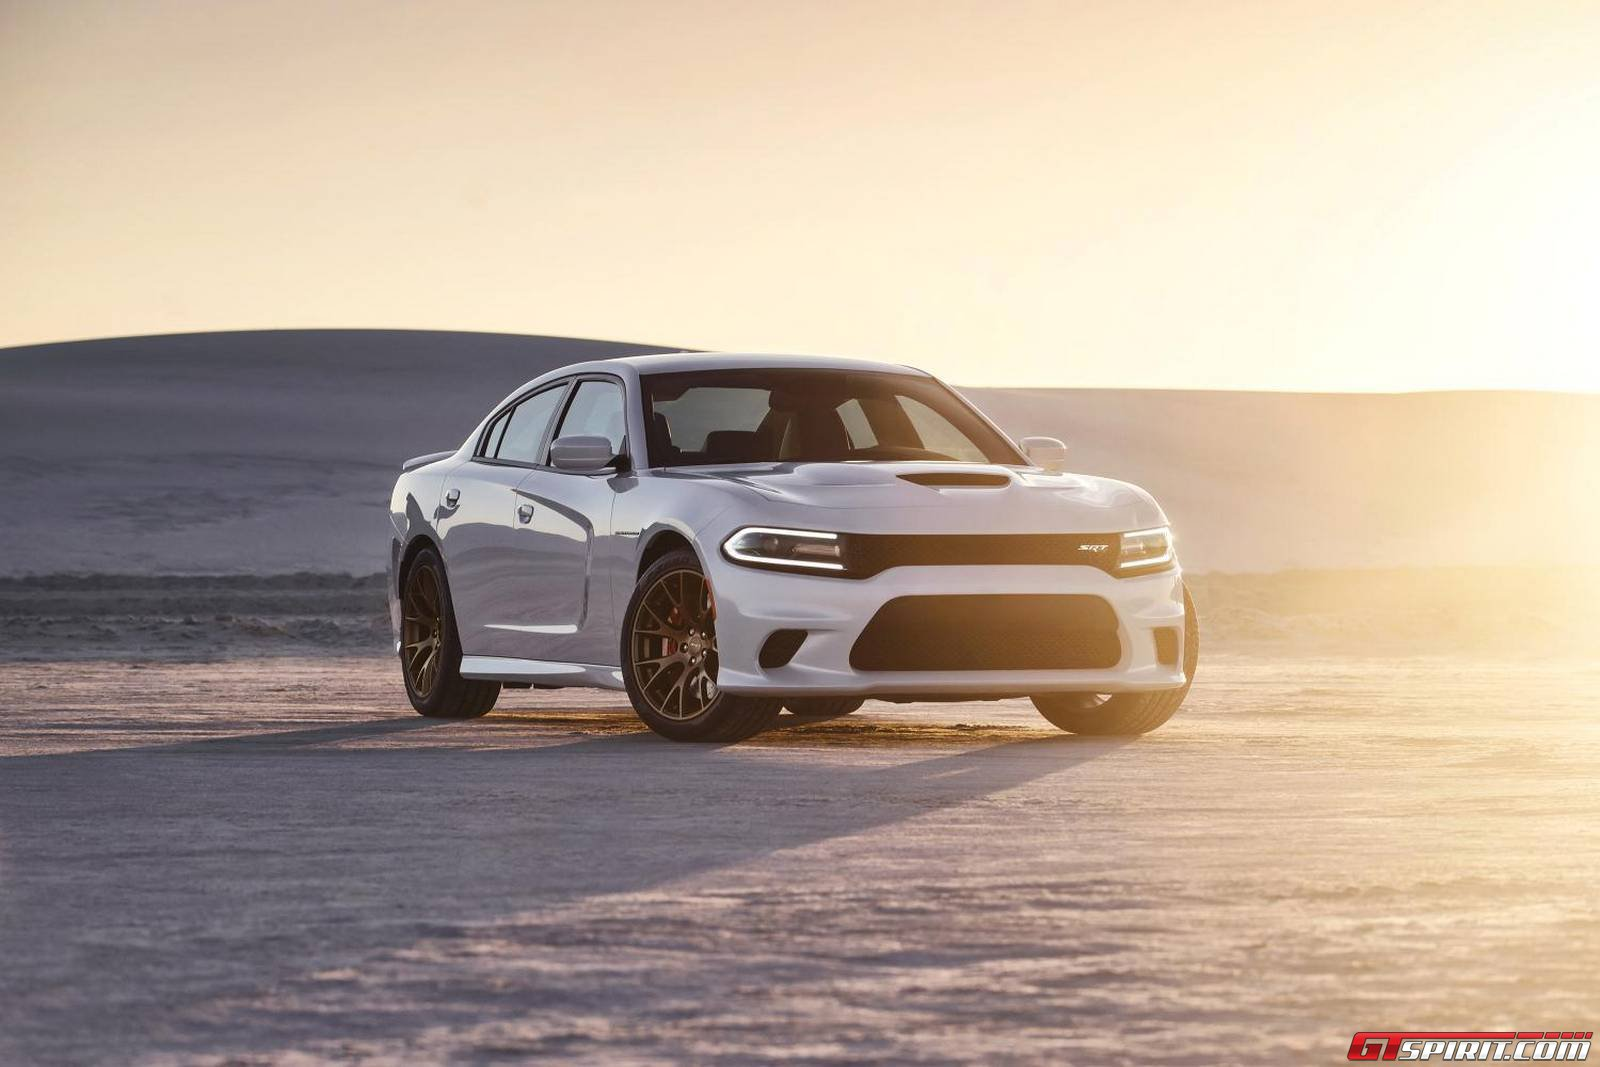 Video 2015 Dodge Charger Srt Hellcat Commercial Gtspirit